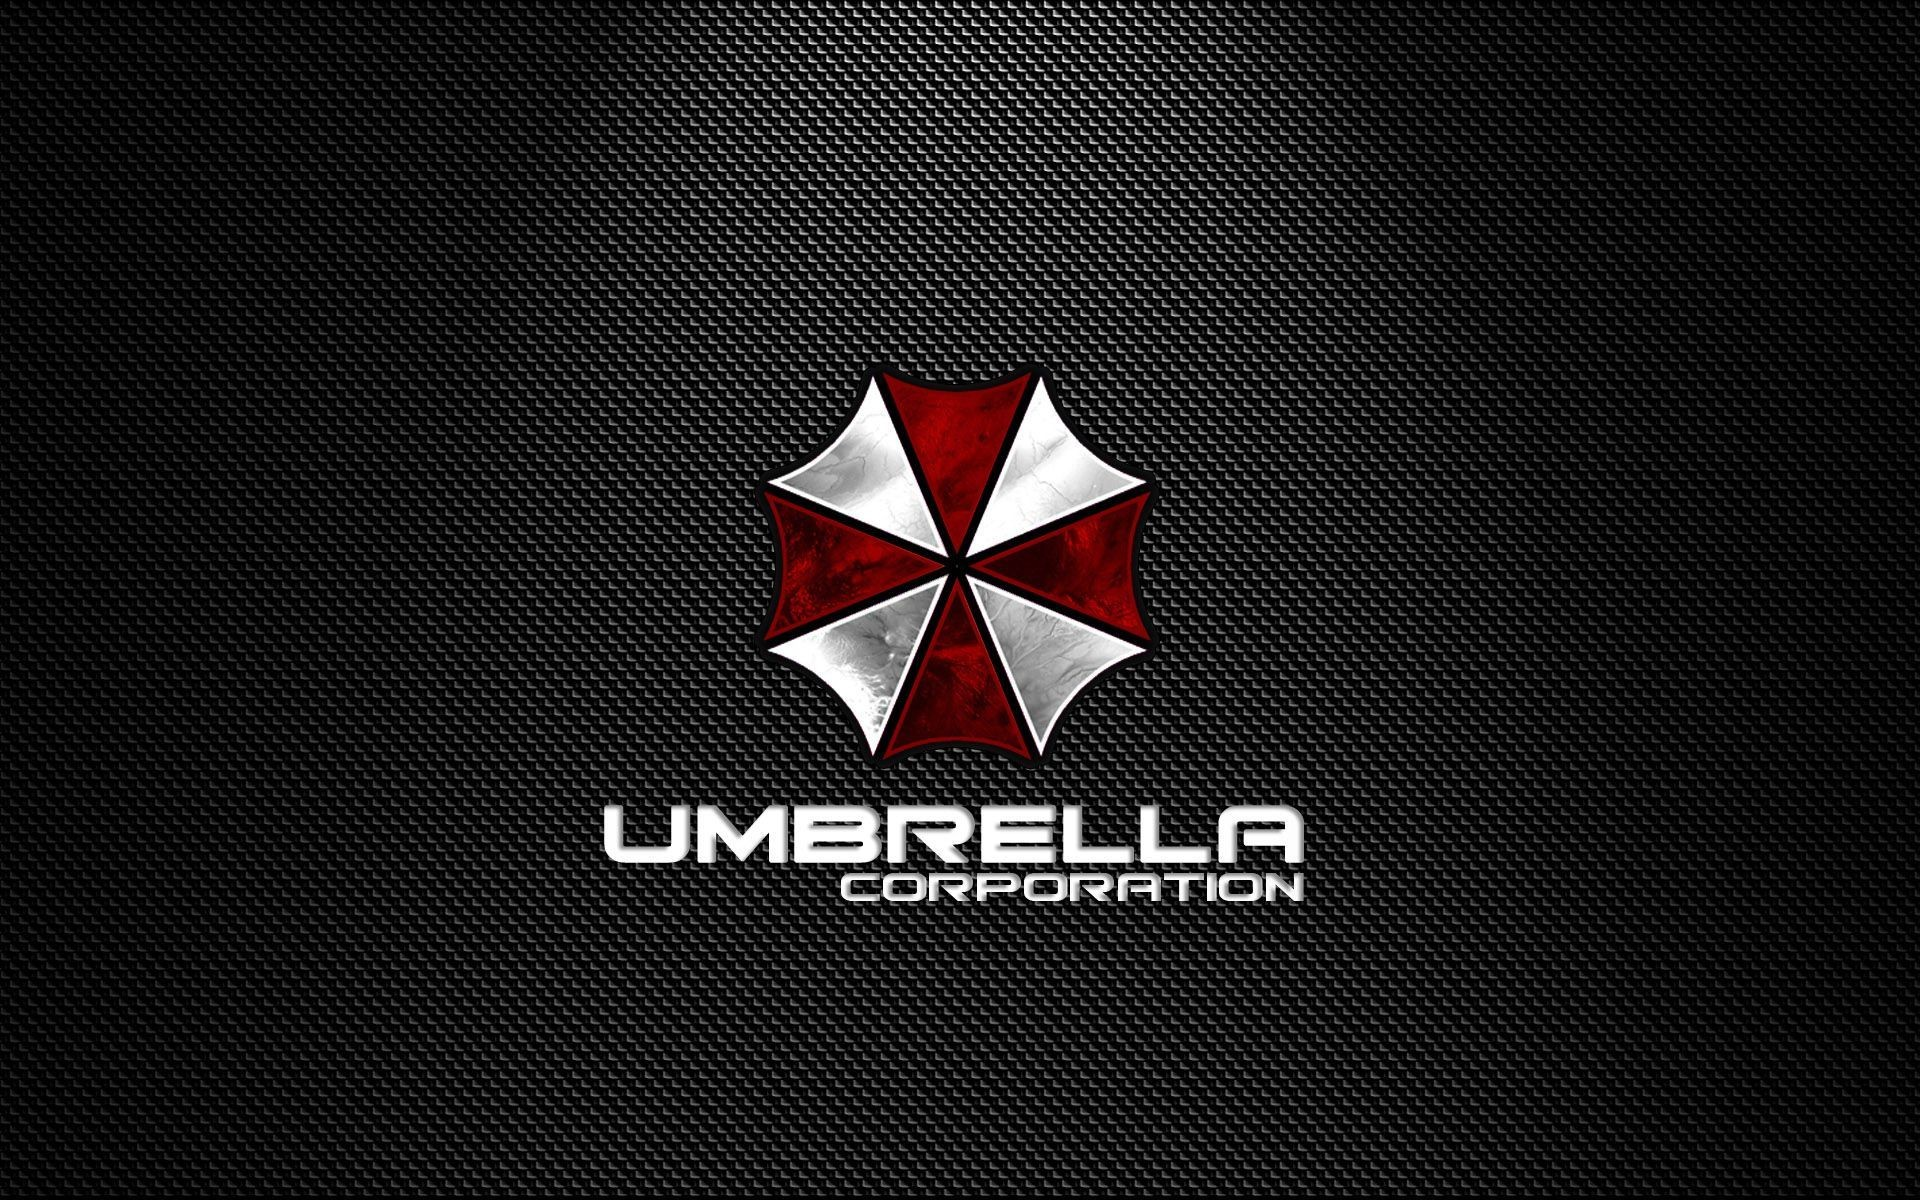 Georgia bulldogs wallpaper hd 62 images - Umbrella corporation wallpaper hd 1366x768 ...